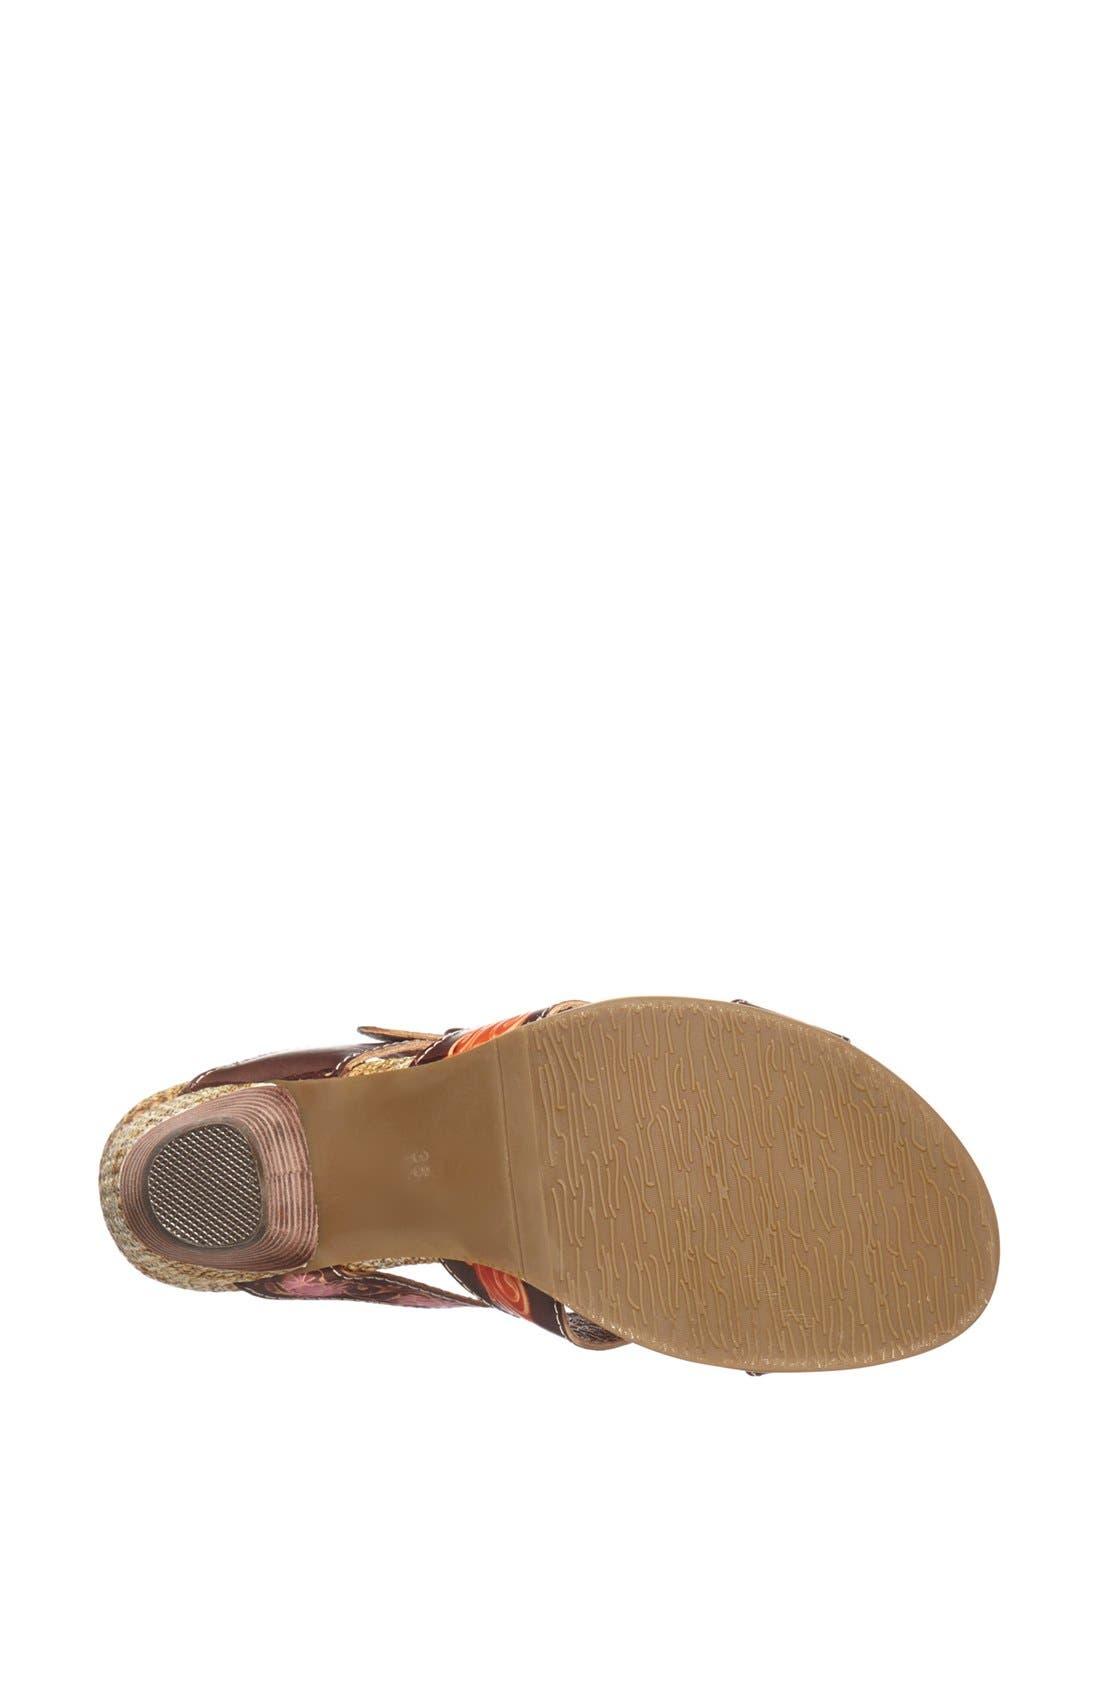 Alternate Image 4  - Spring Step 'Queenie' Leather Sandal